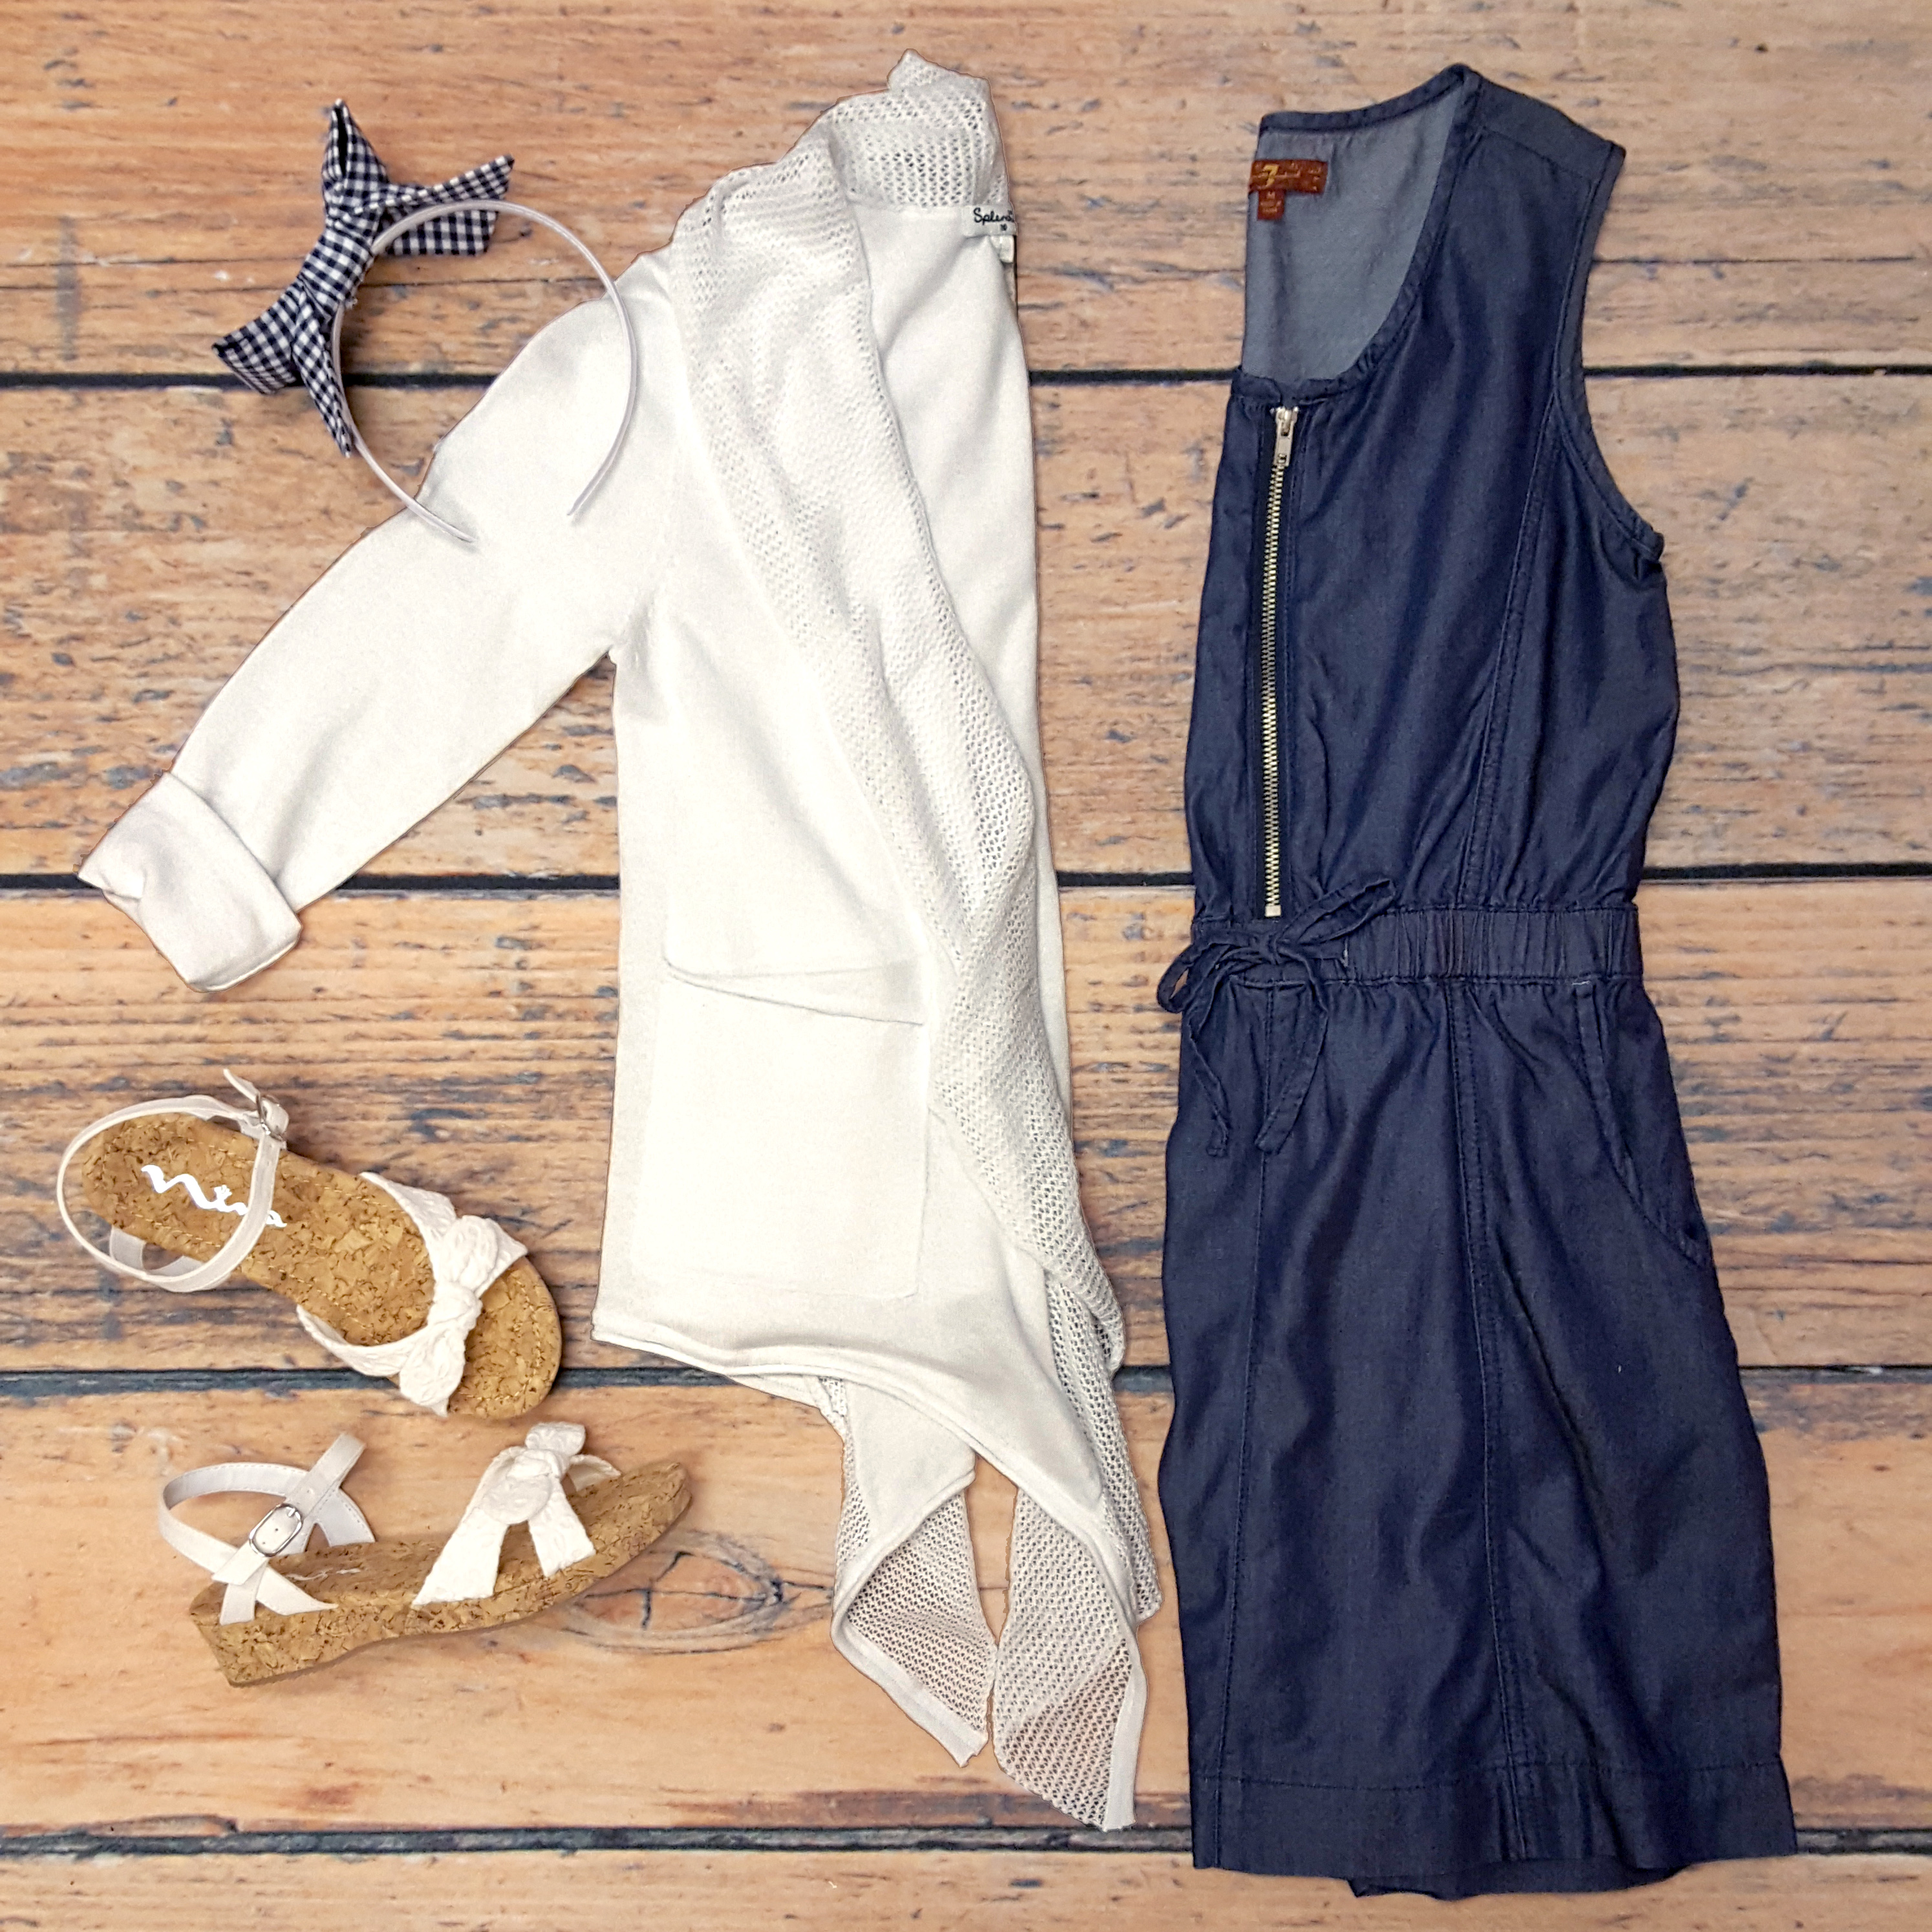 7 for All Mankind Dress,Splendid Cardi,Nina Wedges